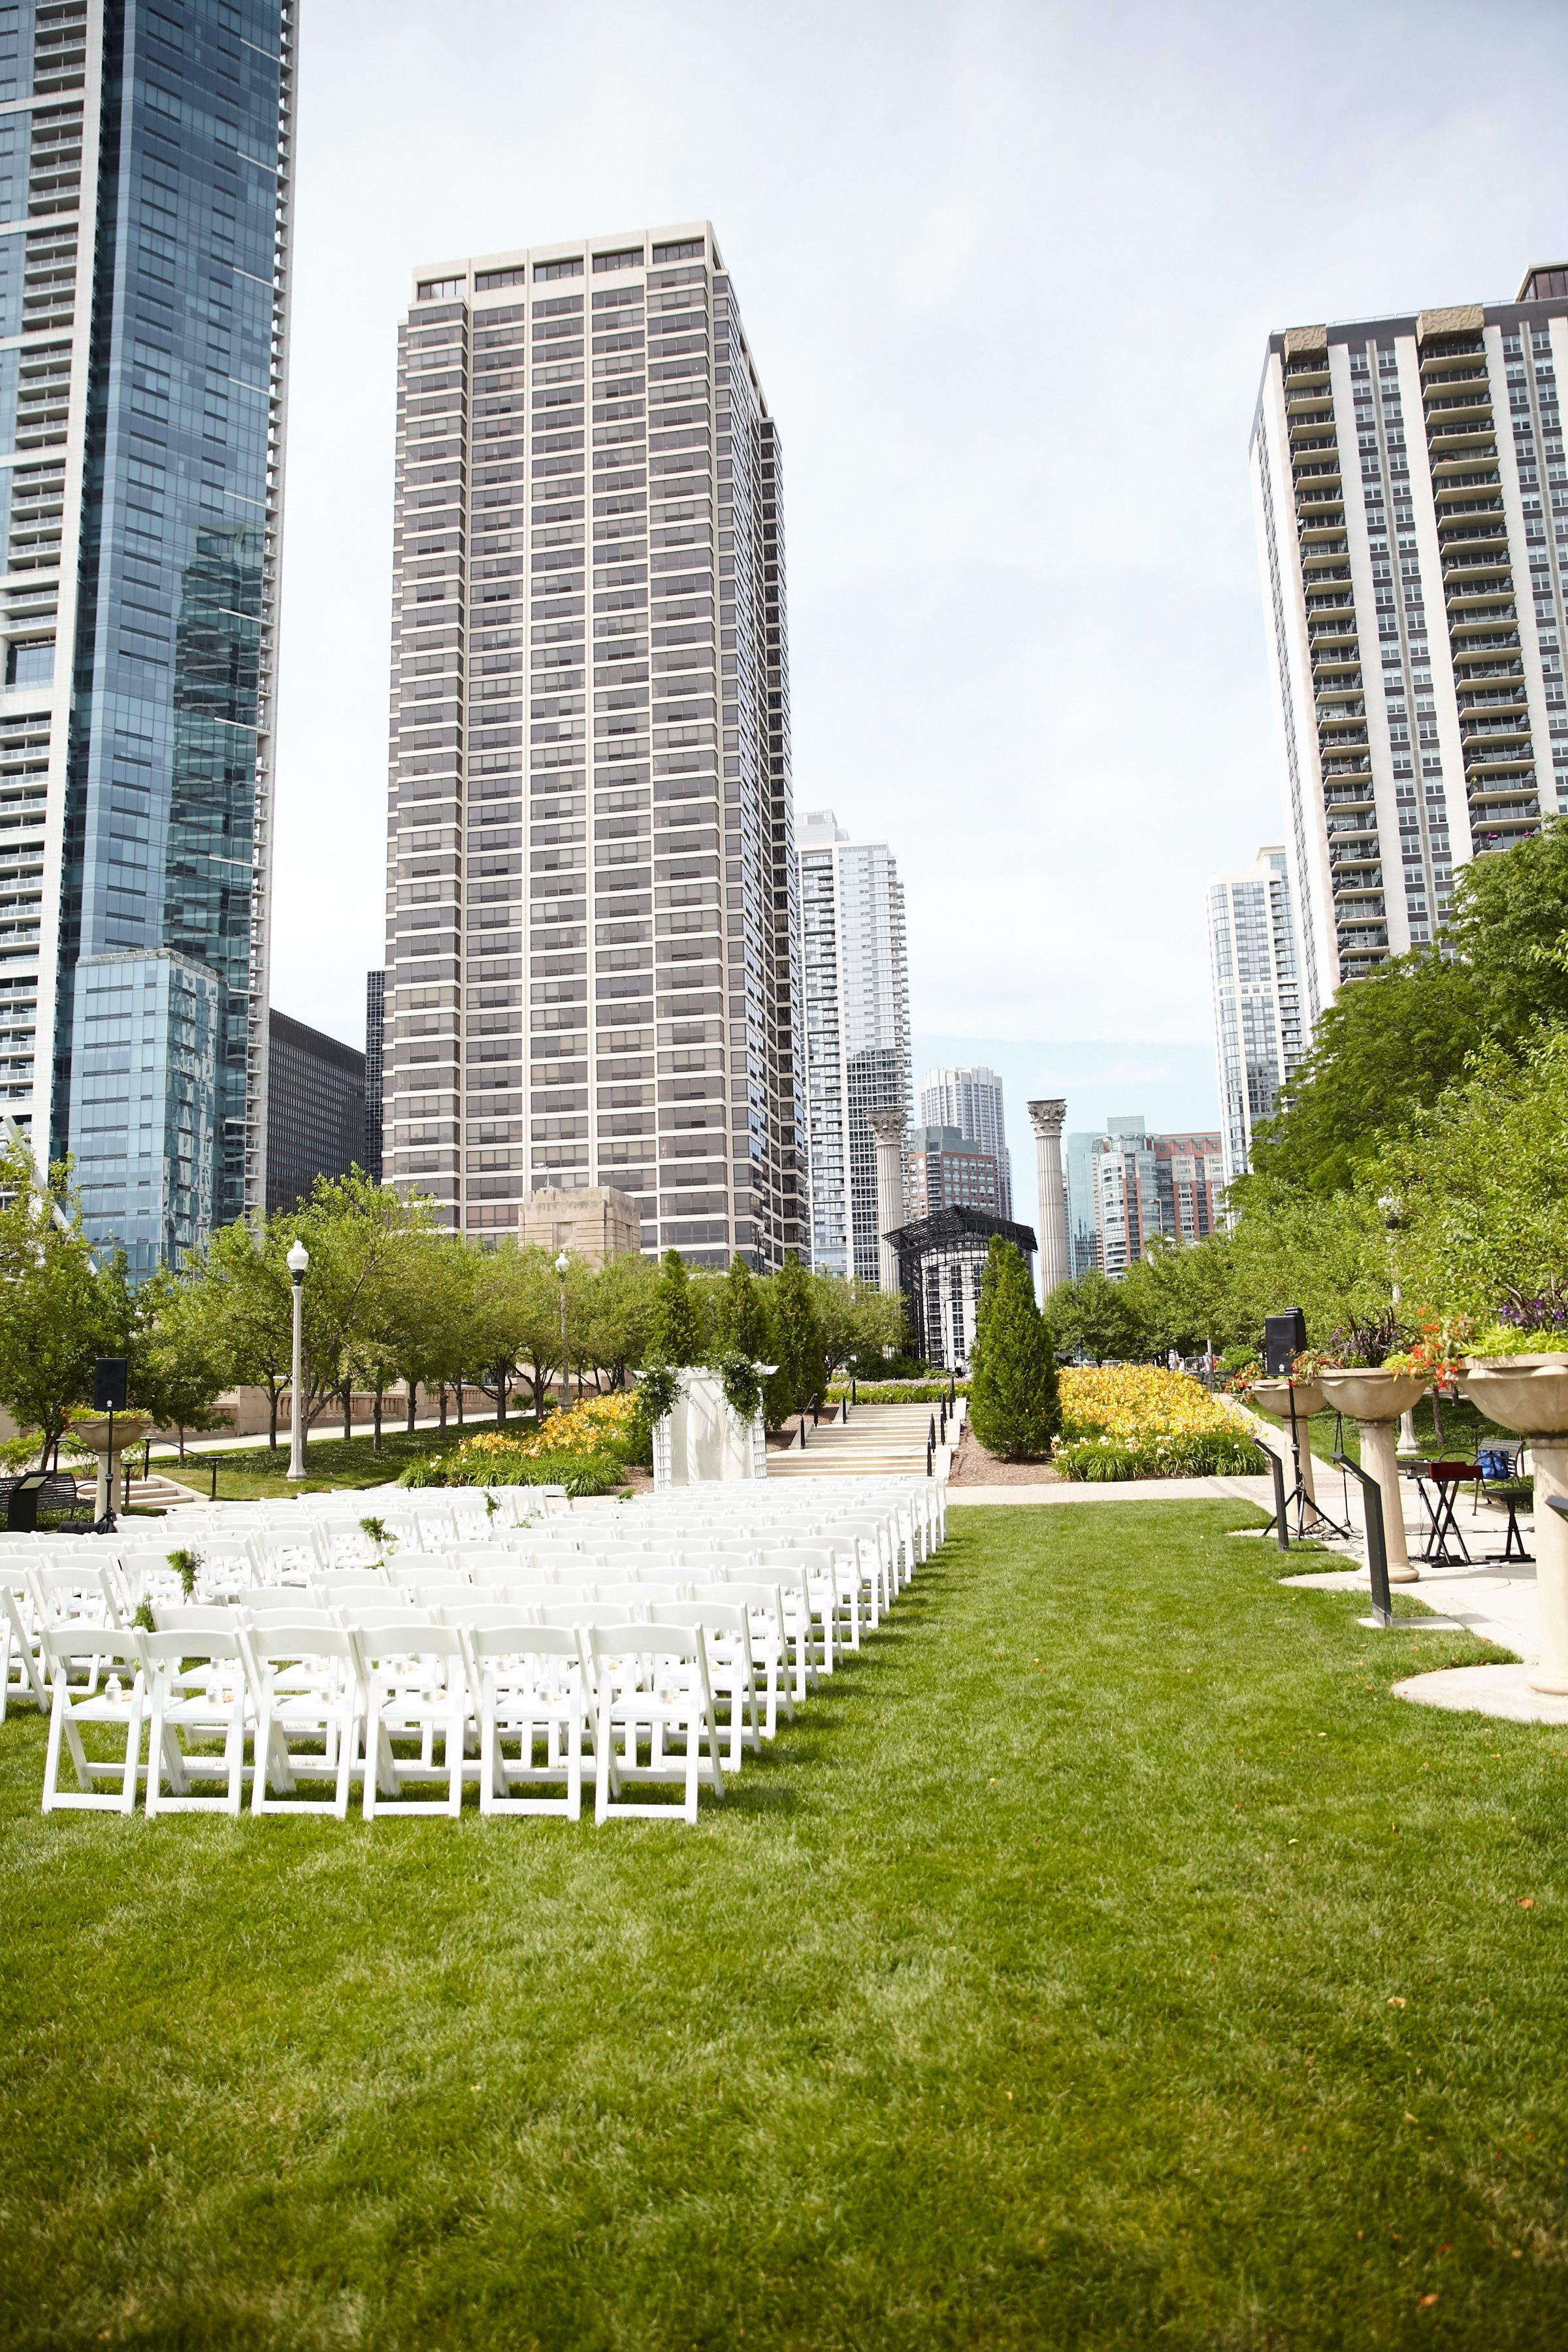 ceremony seating, Cancer Survivor Park, Wrap It Up Parties